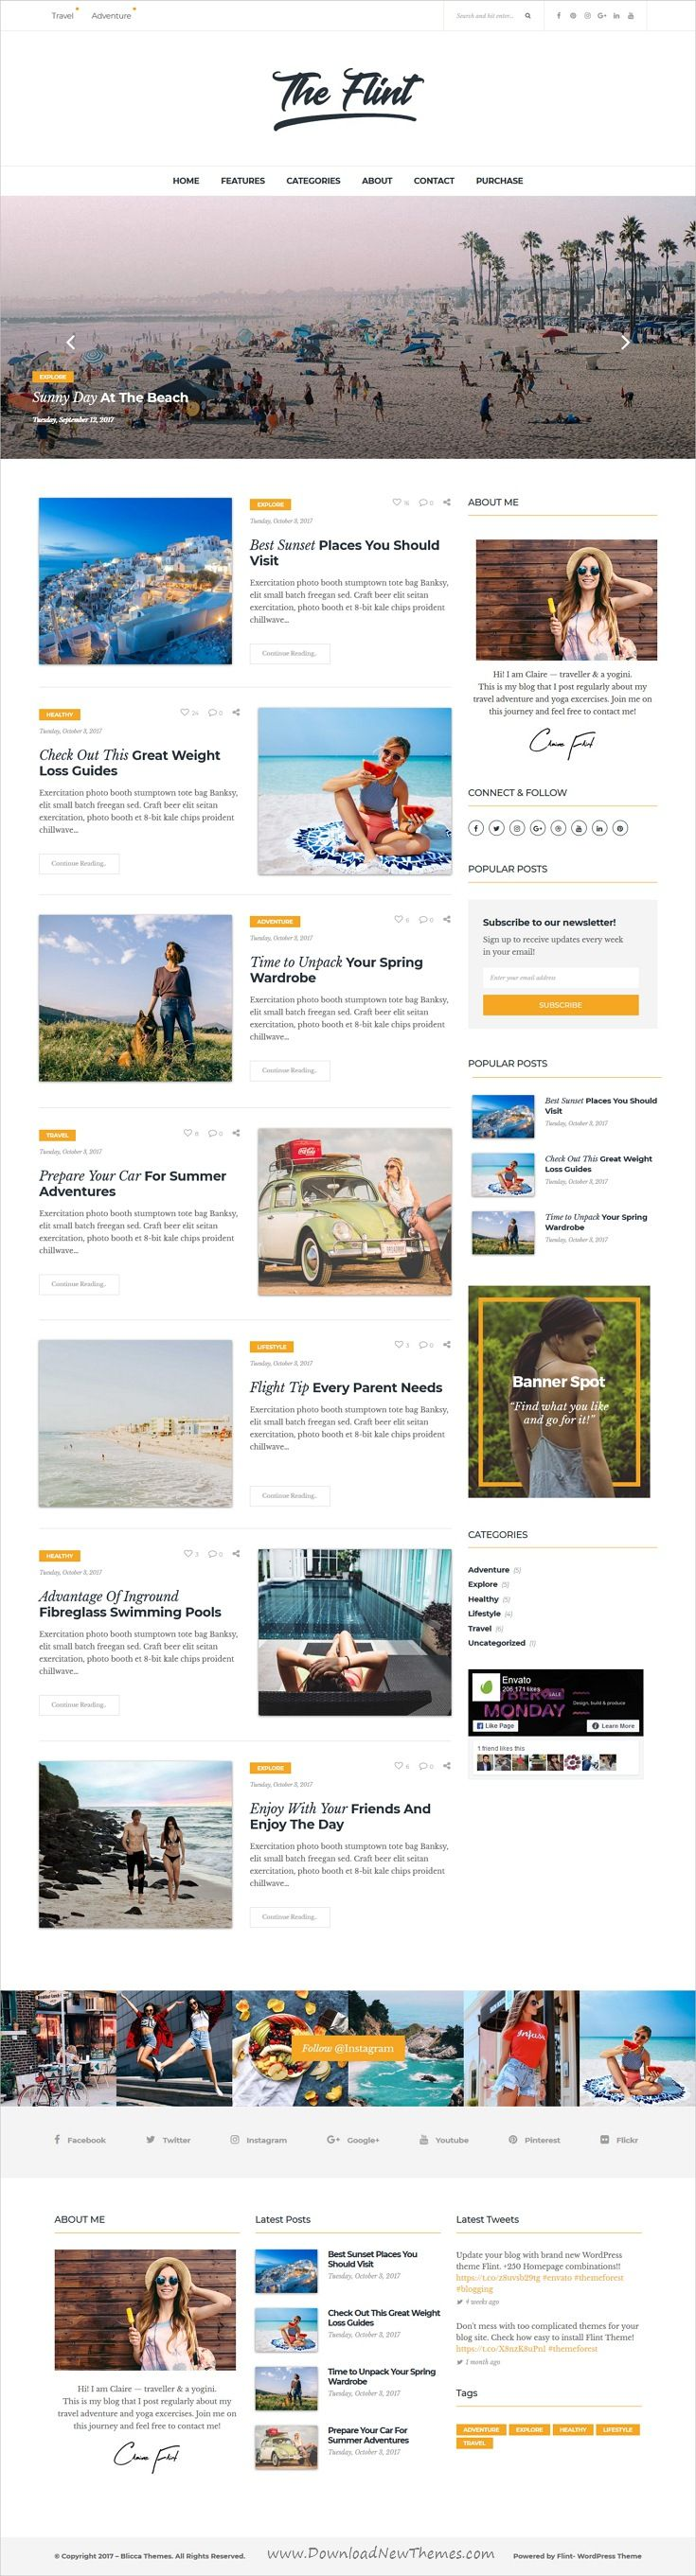 Flint Optimised WordPress Blog Theme Wordpress